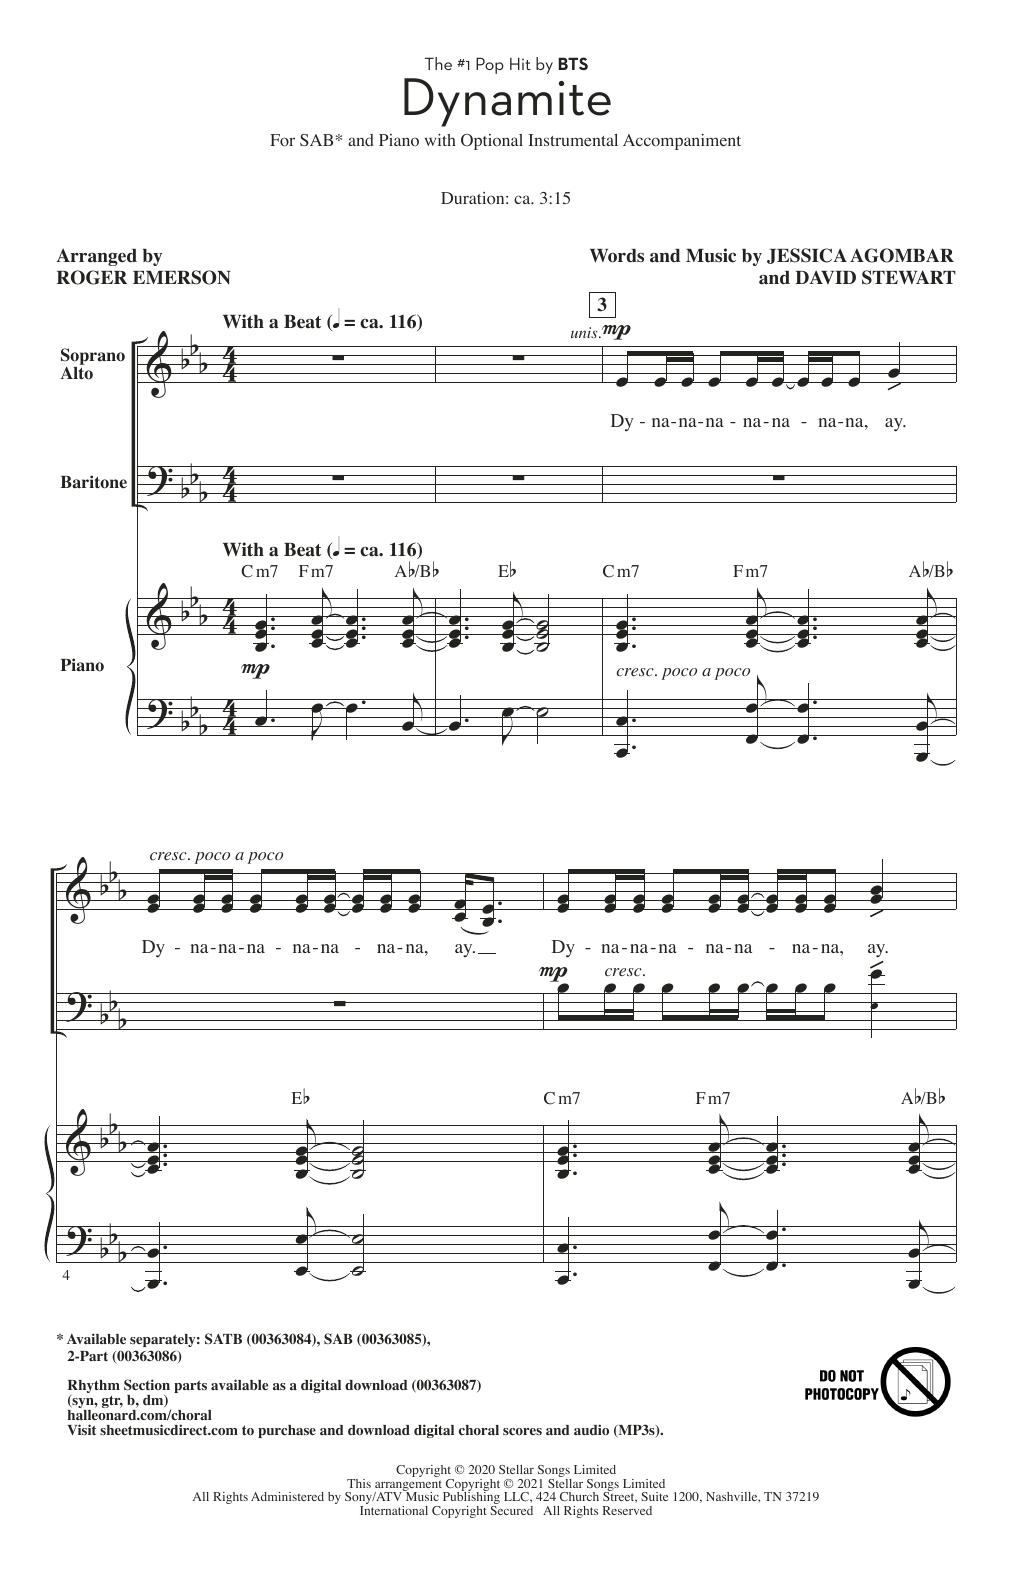 BTS Dynamite (arr. Roger Emerson) sheet music notes printable PDF score